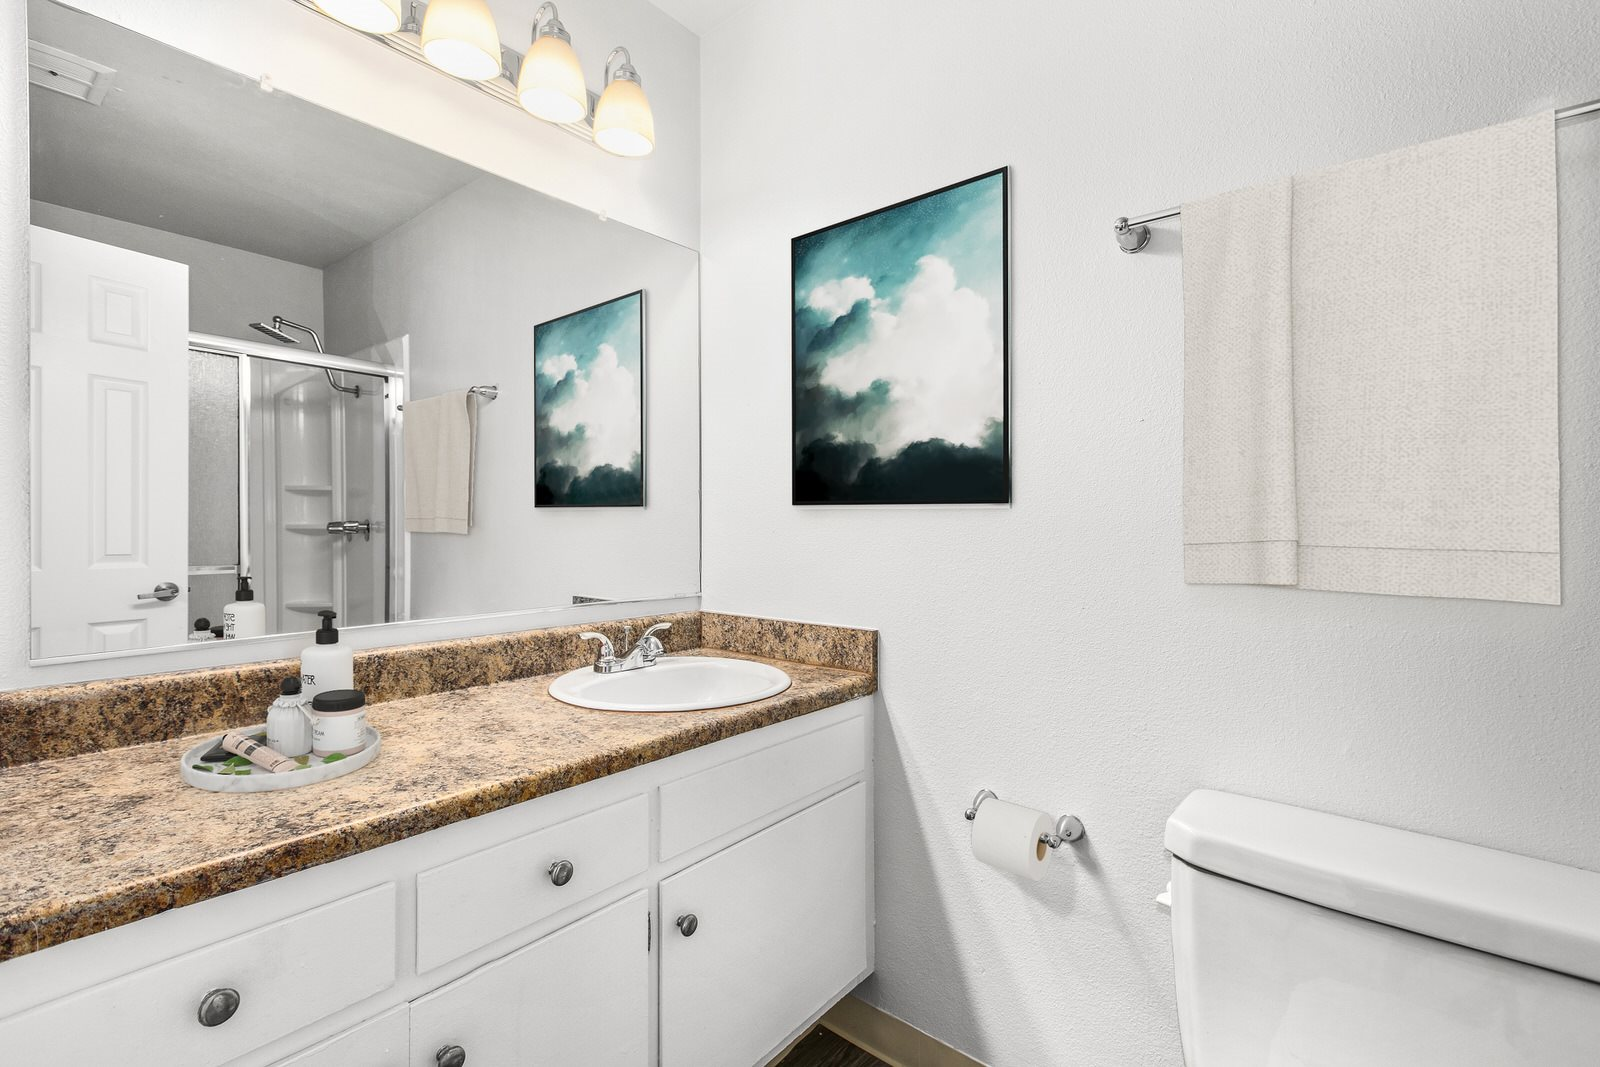 Bathroom Interior Photo at Milano Apartments 20900 Anza Ave Torrance, CA 90503